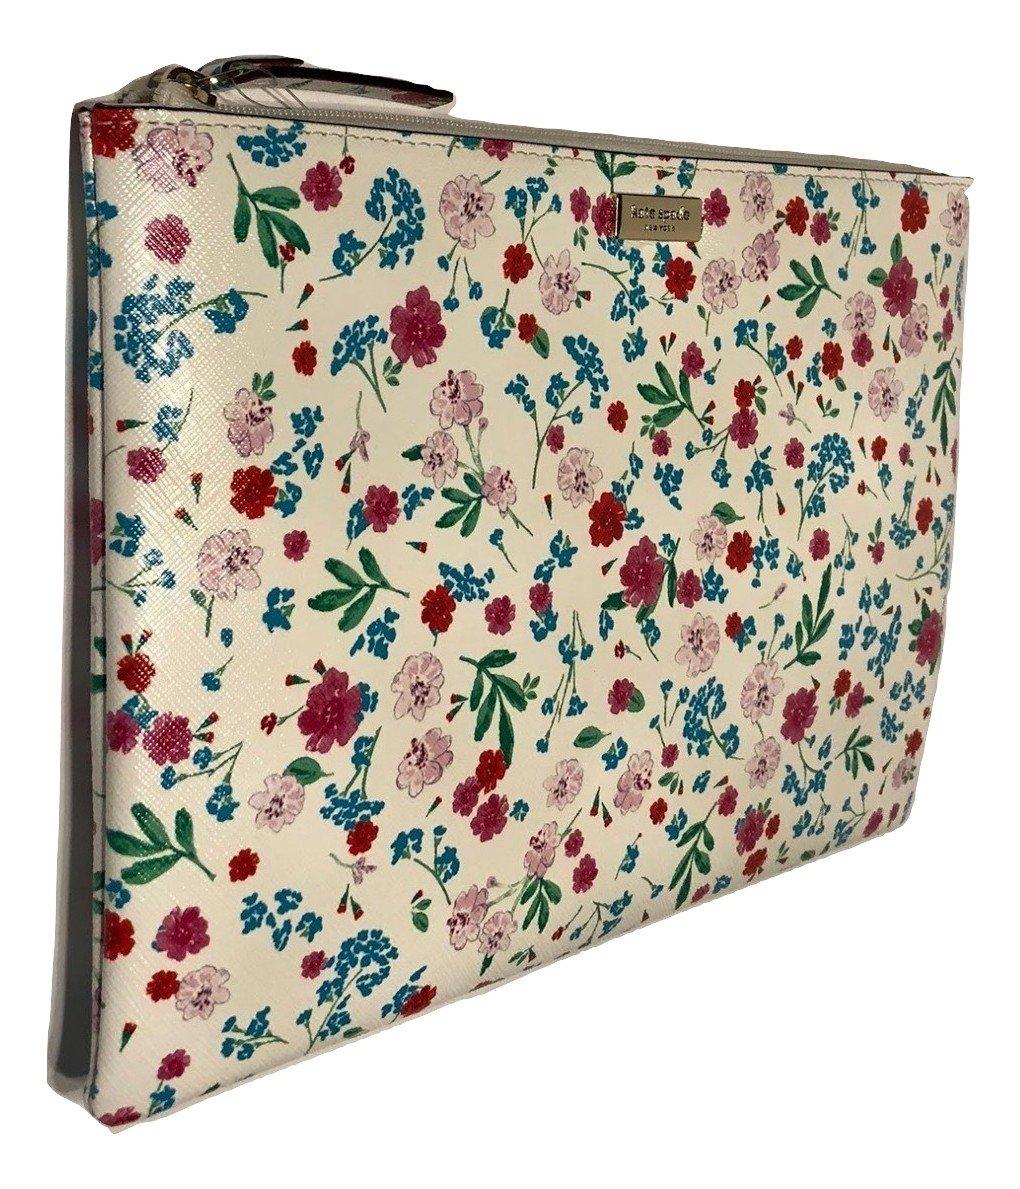 Kate Spade New York Gardner Street Greenhouse Gia Clutch WLRU4881 Cream Floral